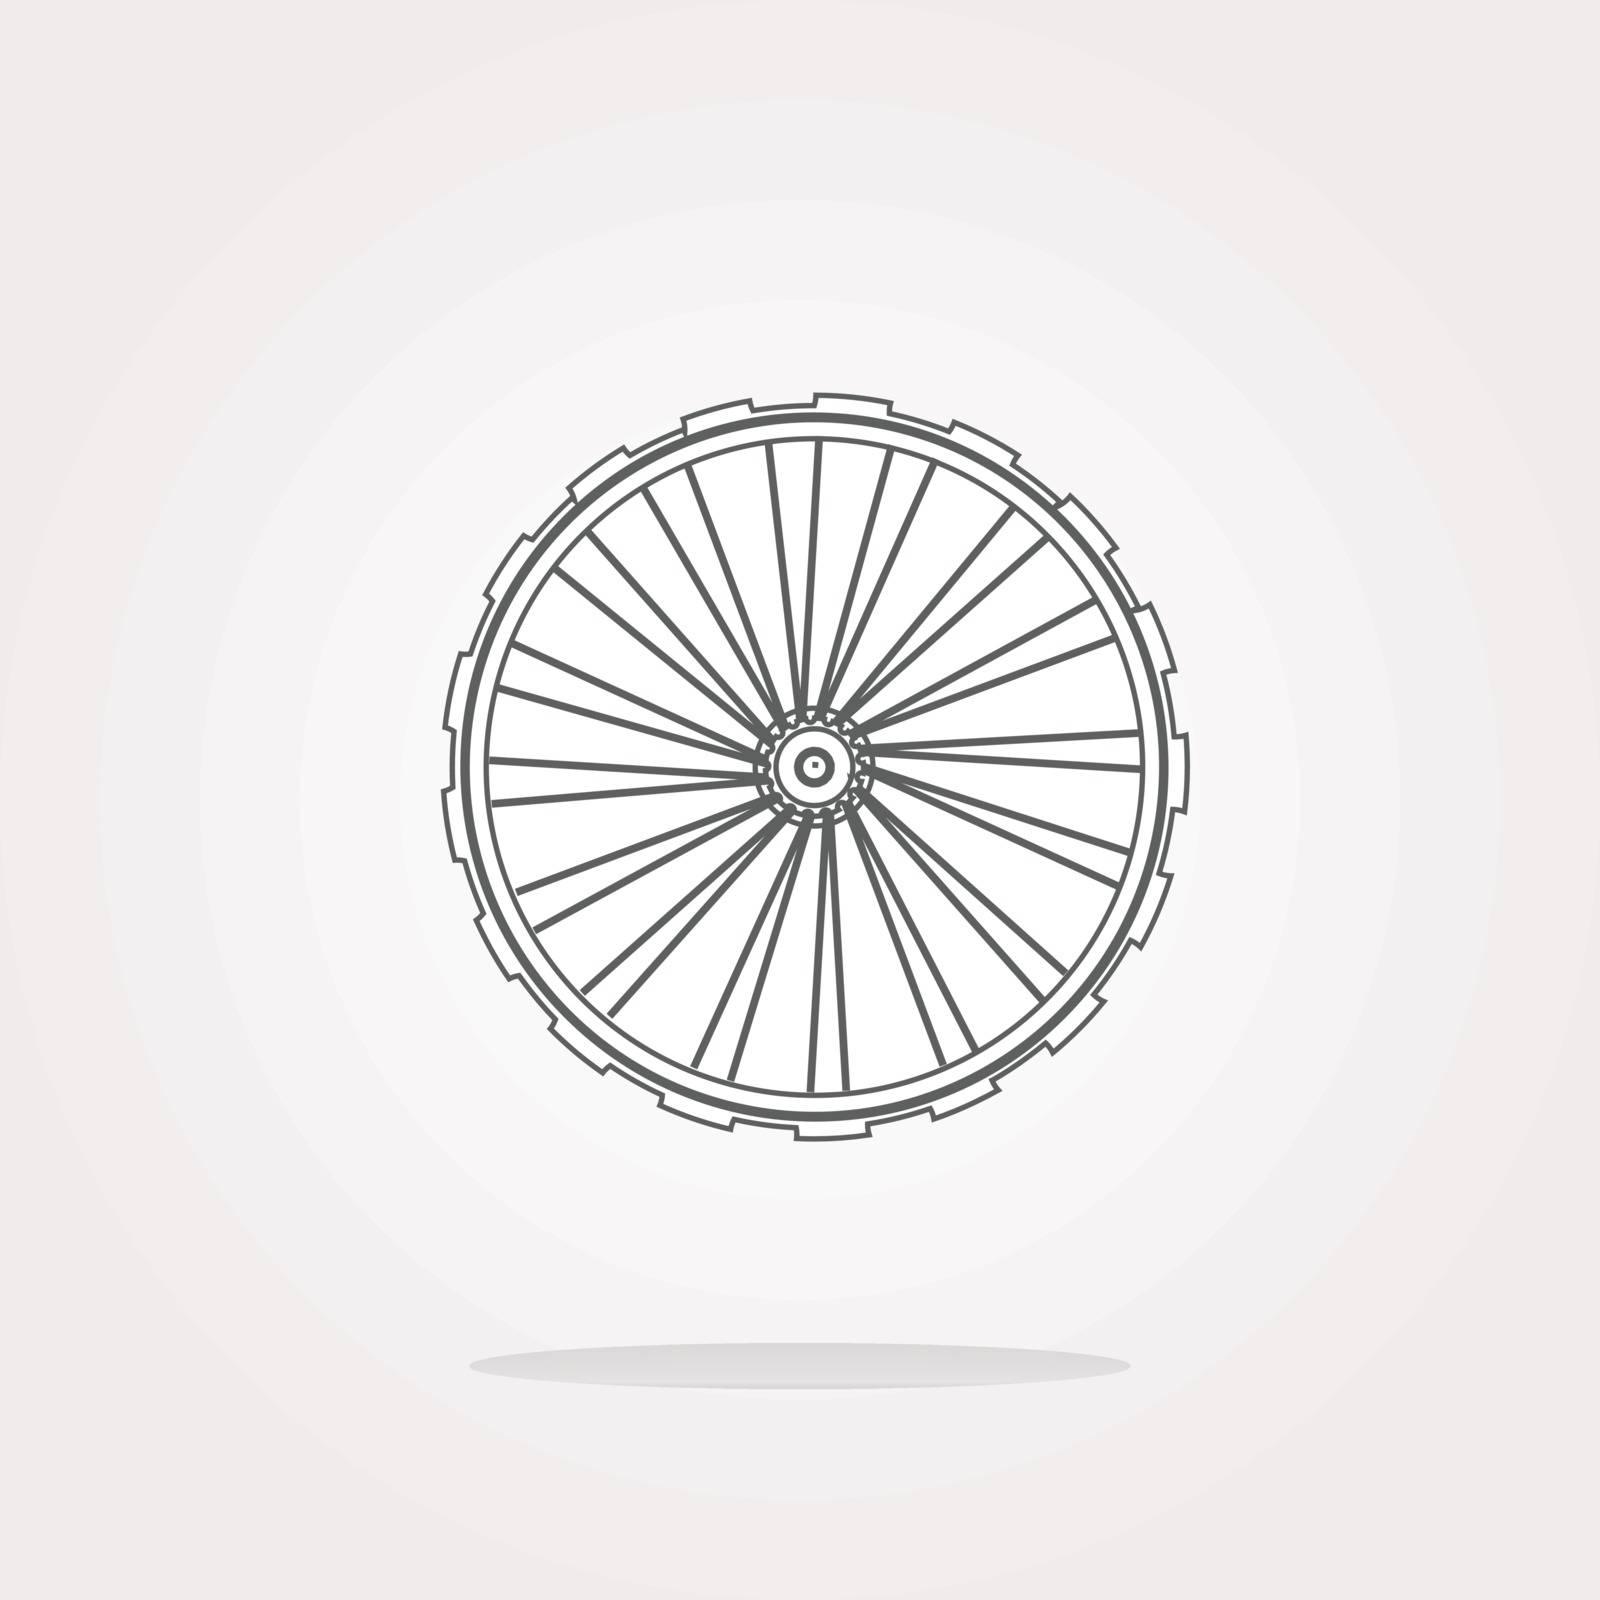 Wheel Icon Vector. Wheel Icon Object. Wheel Icon Picture. Wheel Icon Image. Wheel Icon Graphic. Wheel Icon Art. Wheel Icon JPG. Wheel Icon EPS. Wheel Icon AI. Wheel Icon Drawing